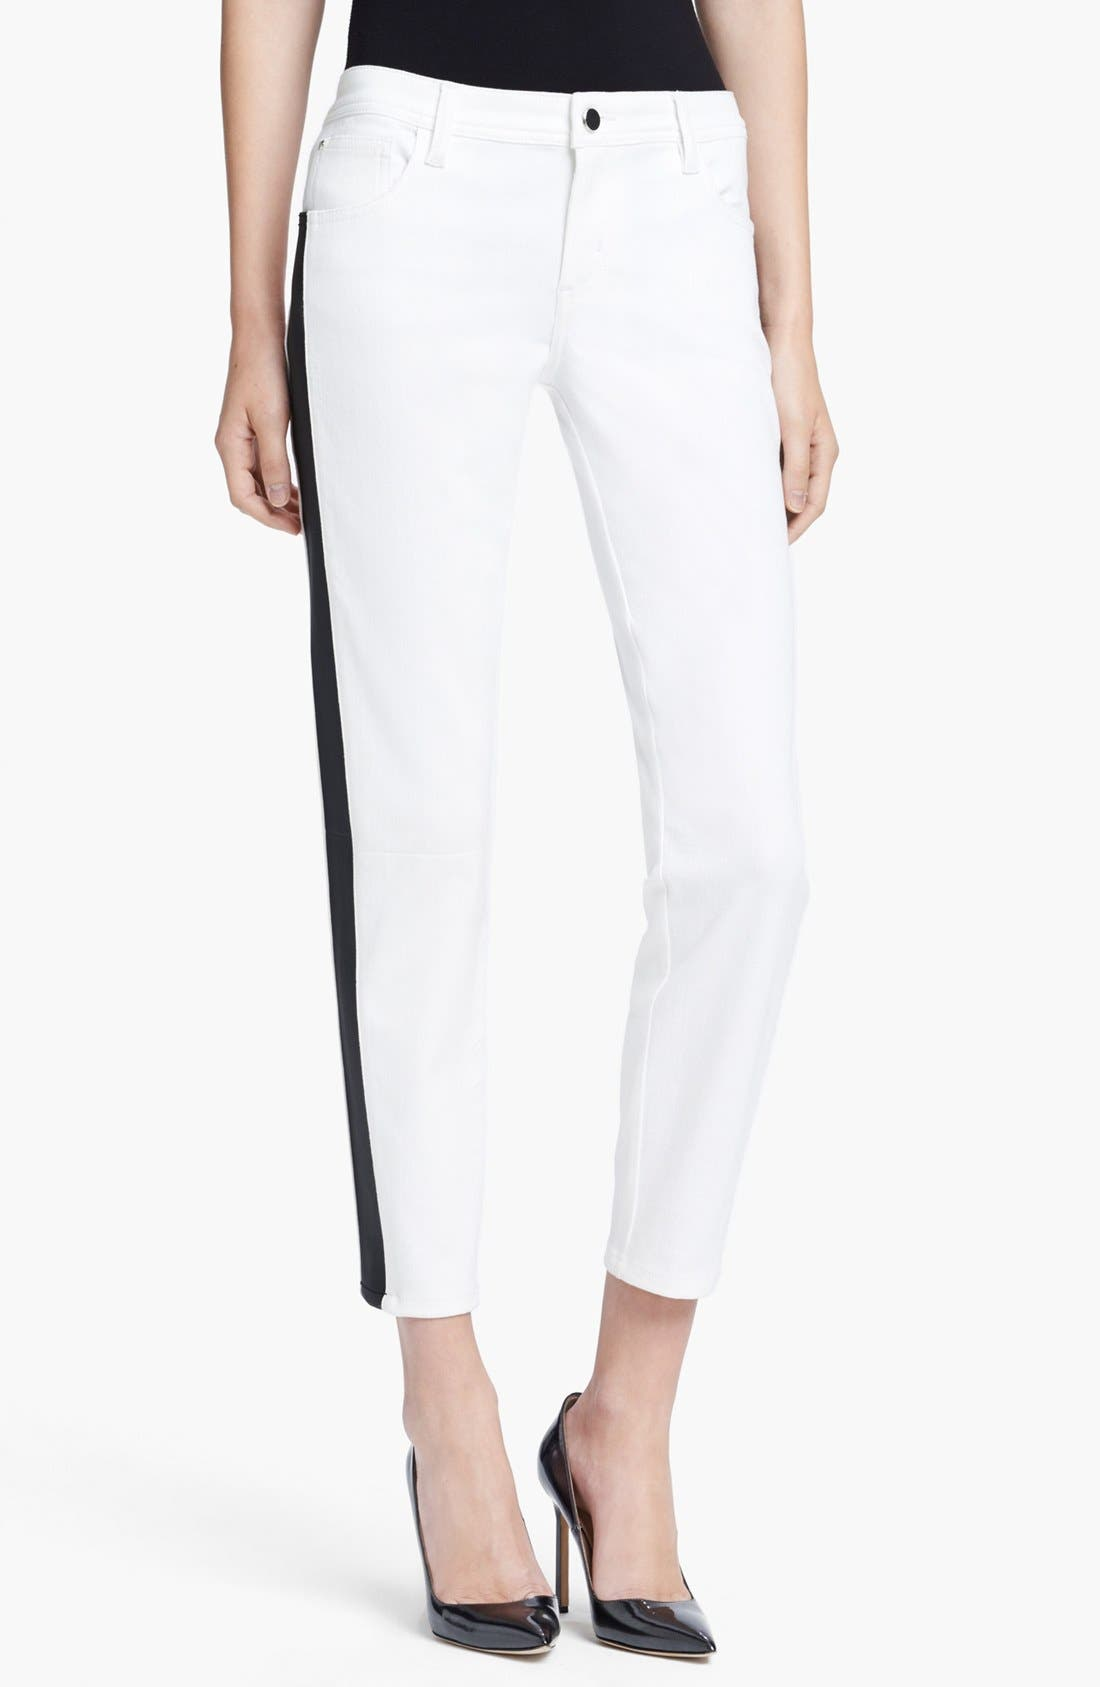 Alternate Image 1 Selected - Faith Connexion Tuxedo Stripe Ankle Jeans